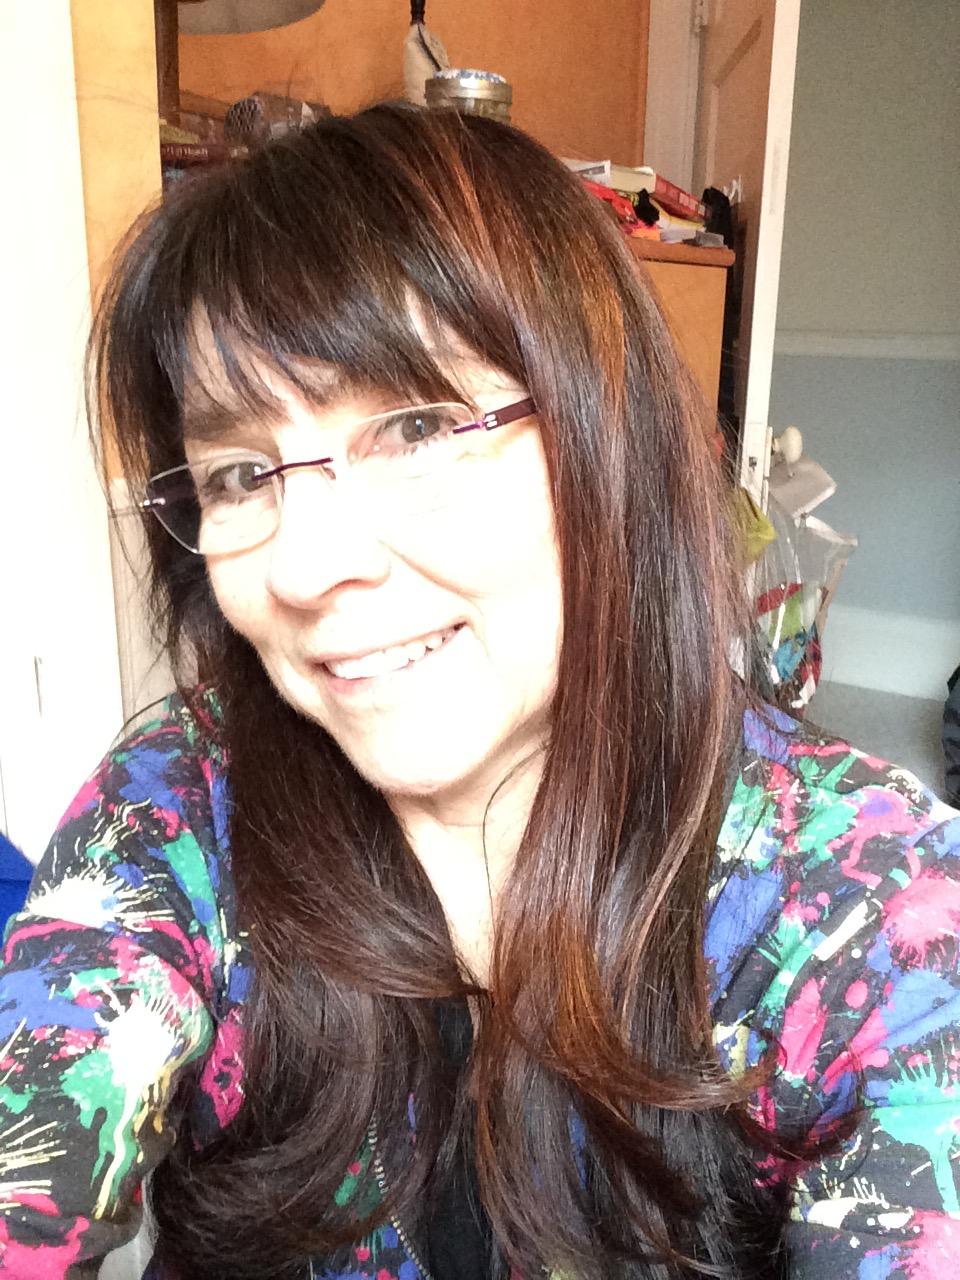 Susan Morales-Kosinec